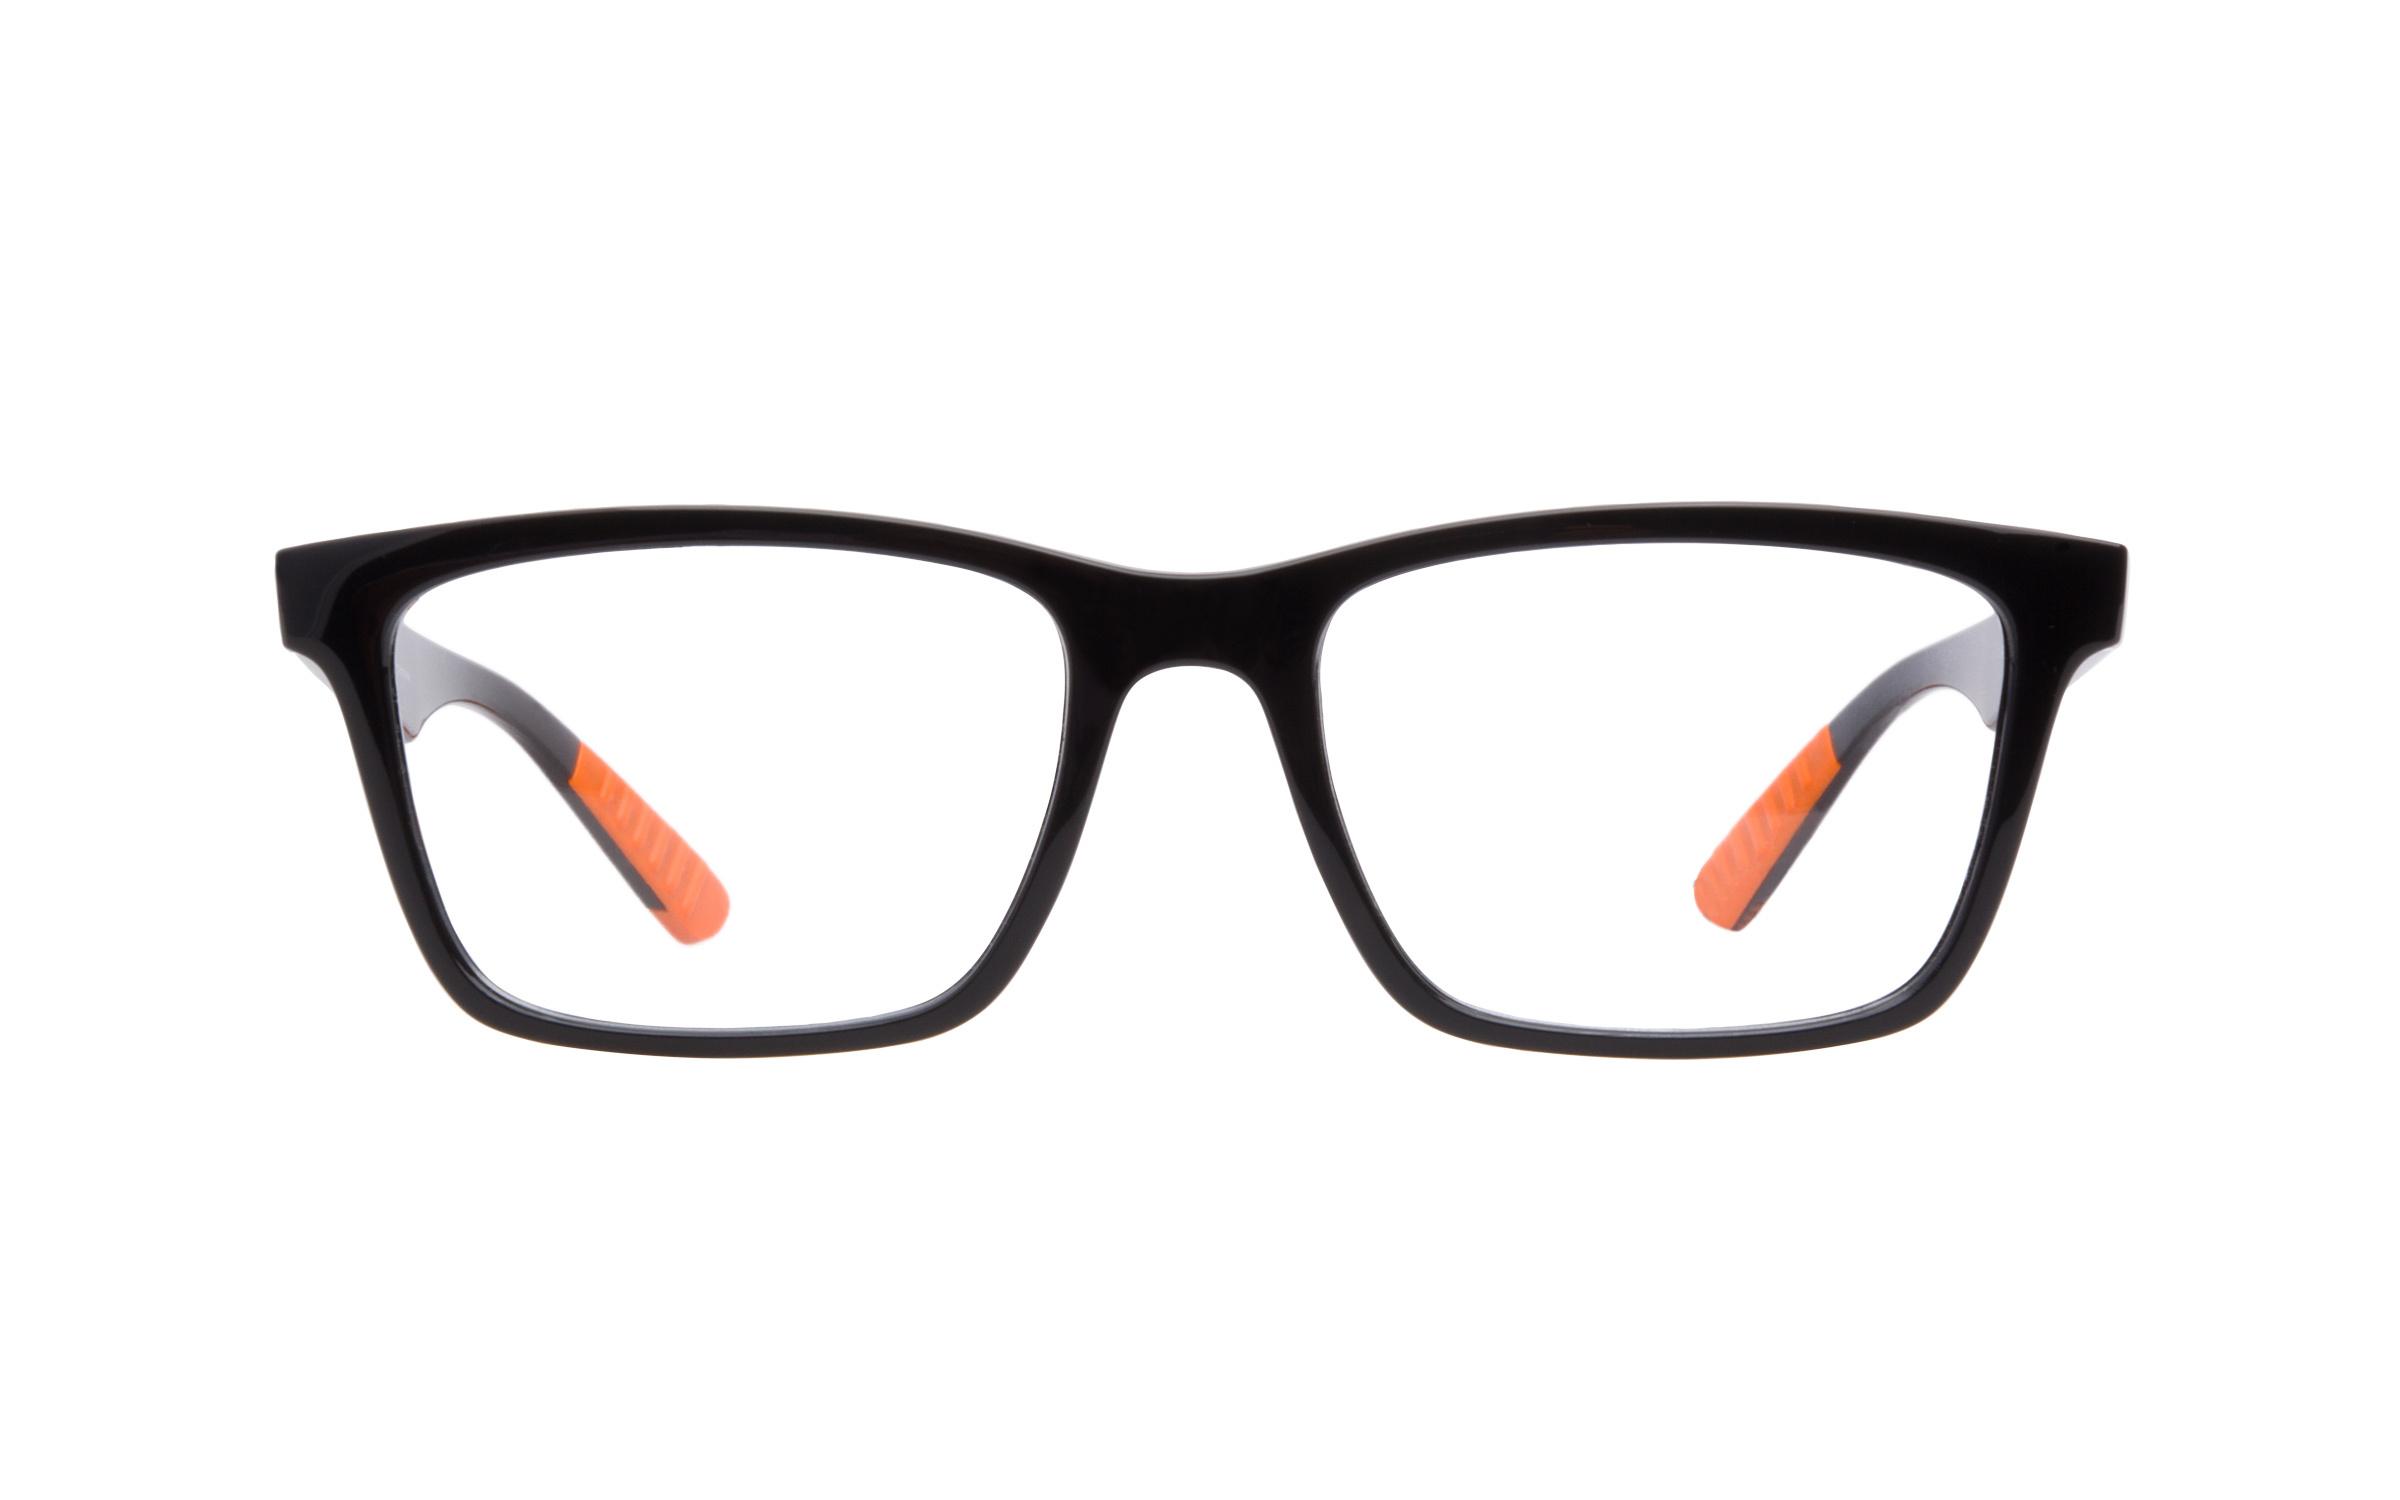 Luxottica Ray-Ban RB7025 5417 Eyeglasses and Frame in Black/Orange | Acetate - Online Coastal